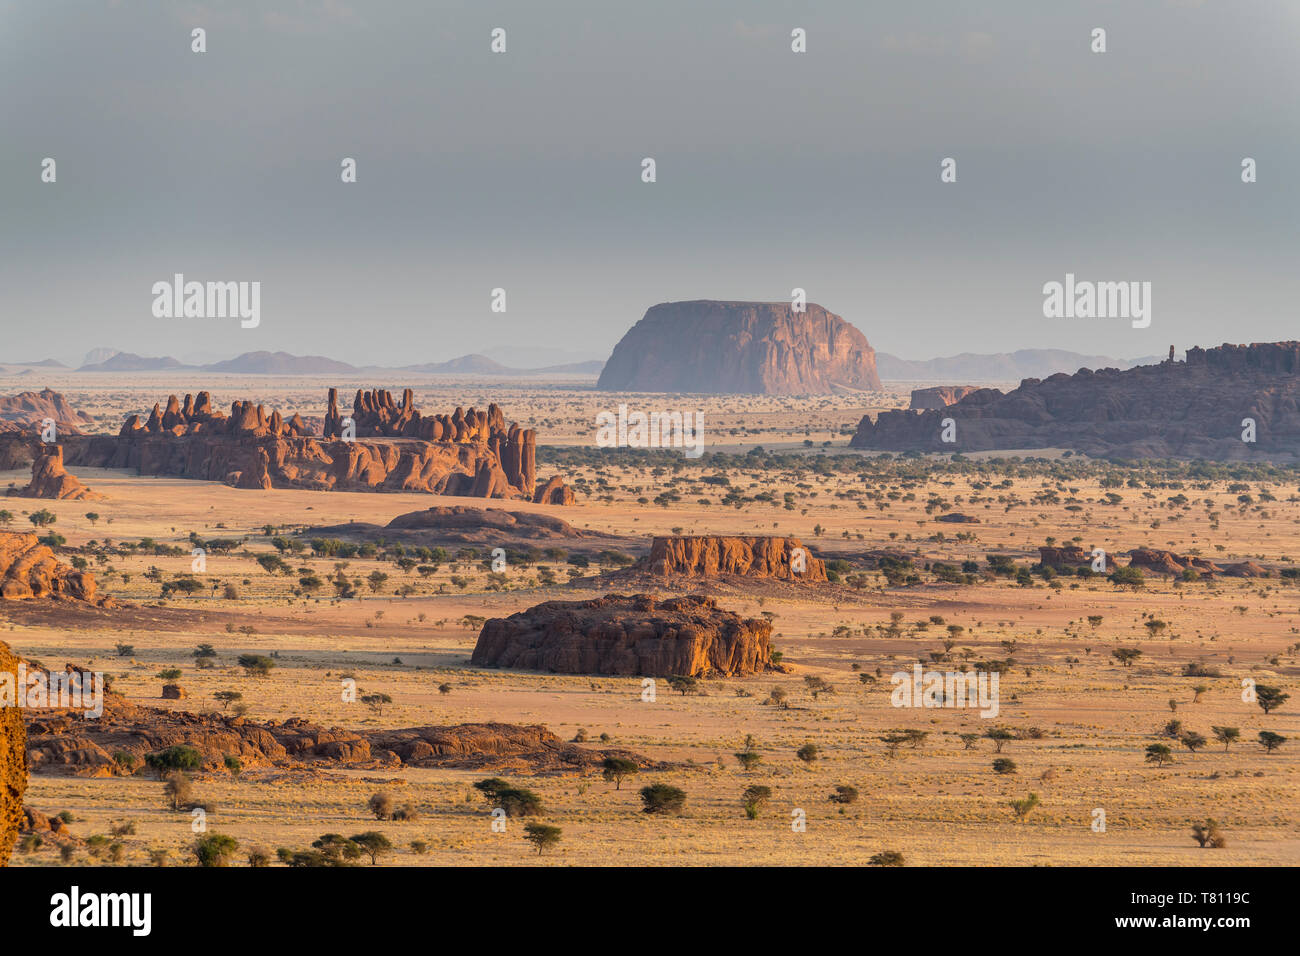 Vistas al precioso paisaje de la Meseta de Ennedi, Sitio del Patrimonio Mundial de la UNESCO, la región de Ennedi, Chad, África Foto de stock